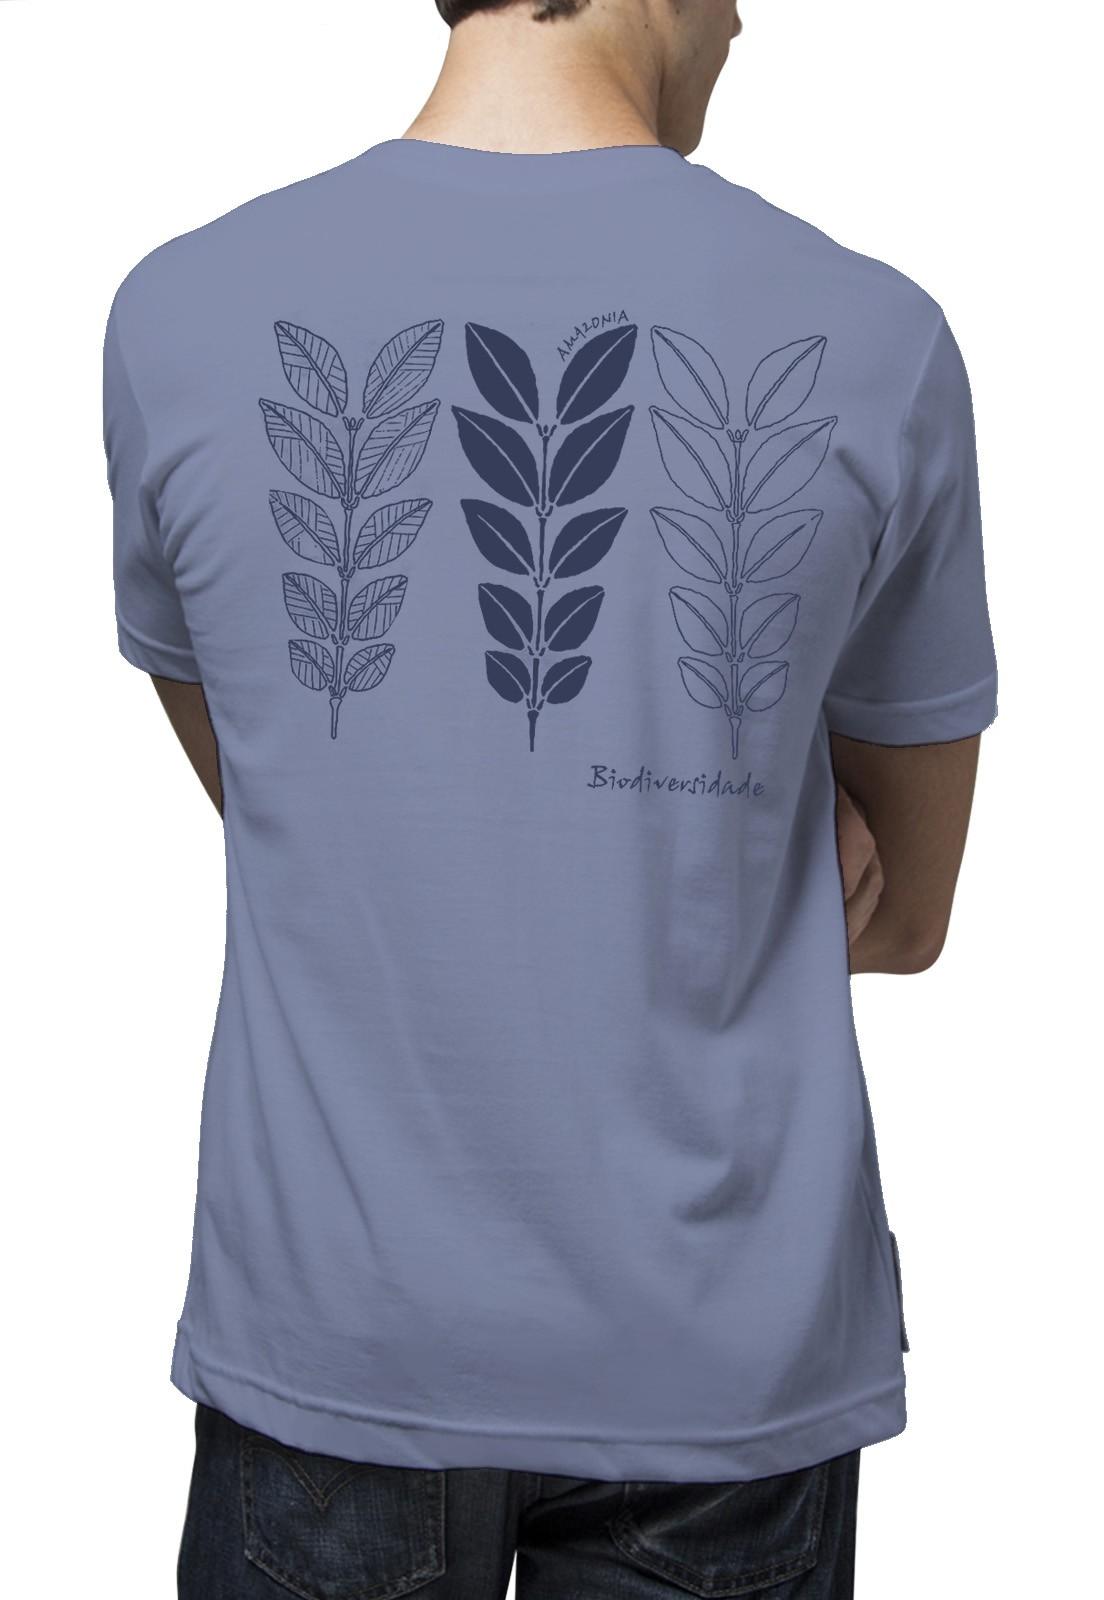 Camiseta Amazônia Biodiversidade - Lilás